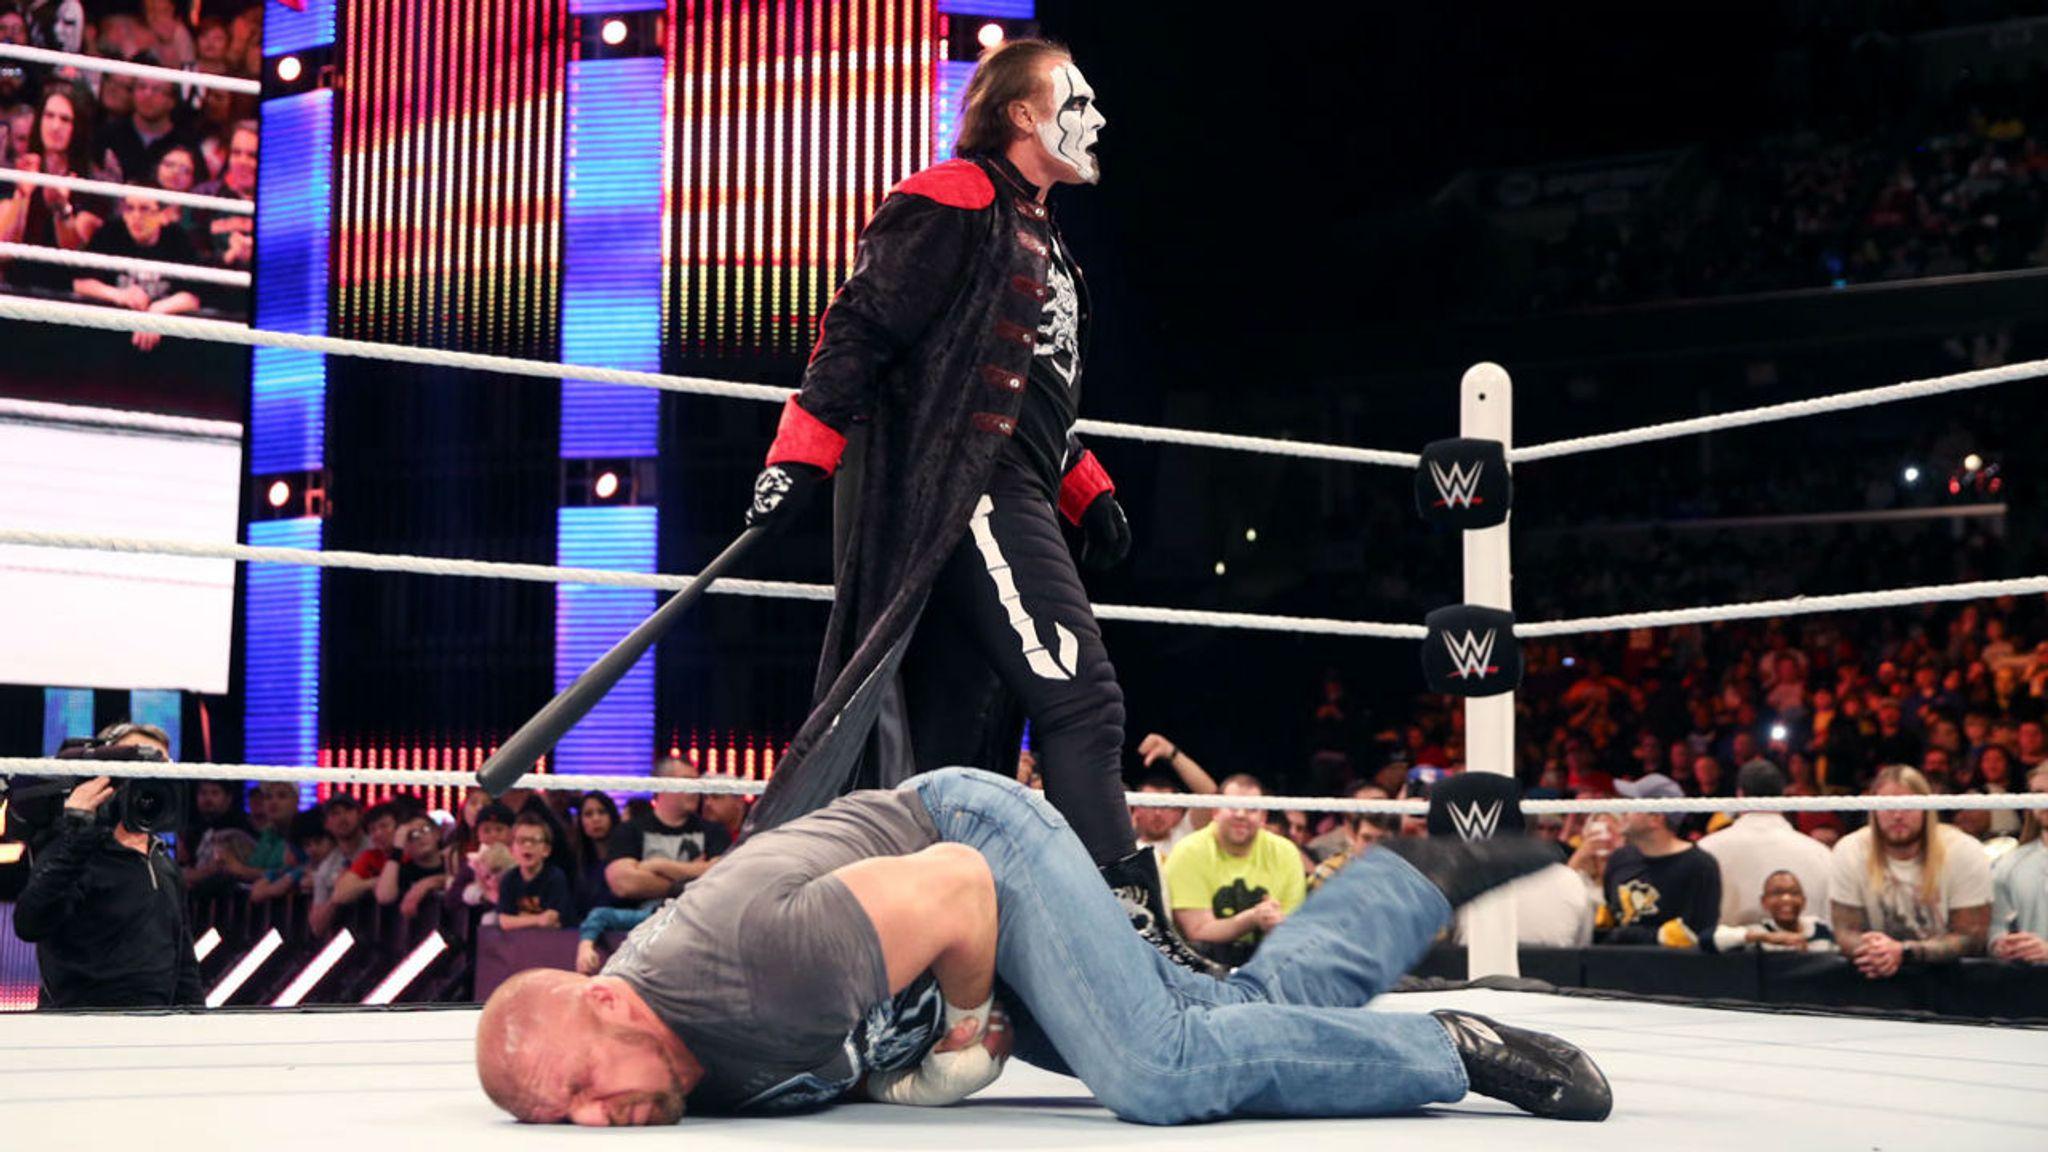 Fastlane 2015: Roman Reigns beats Daniel Bryan, heads to WrestleMania   WWE  News   Sky Sports